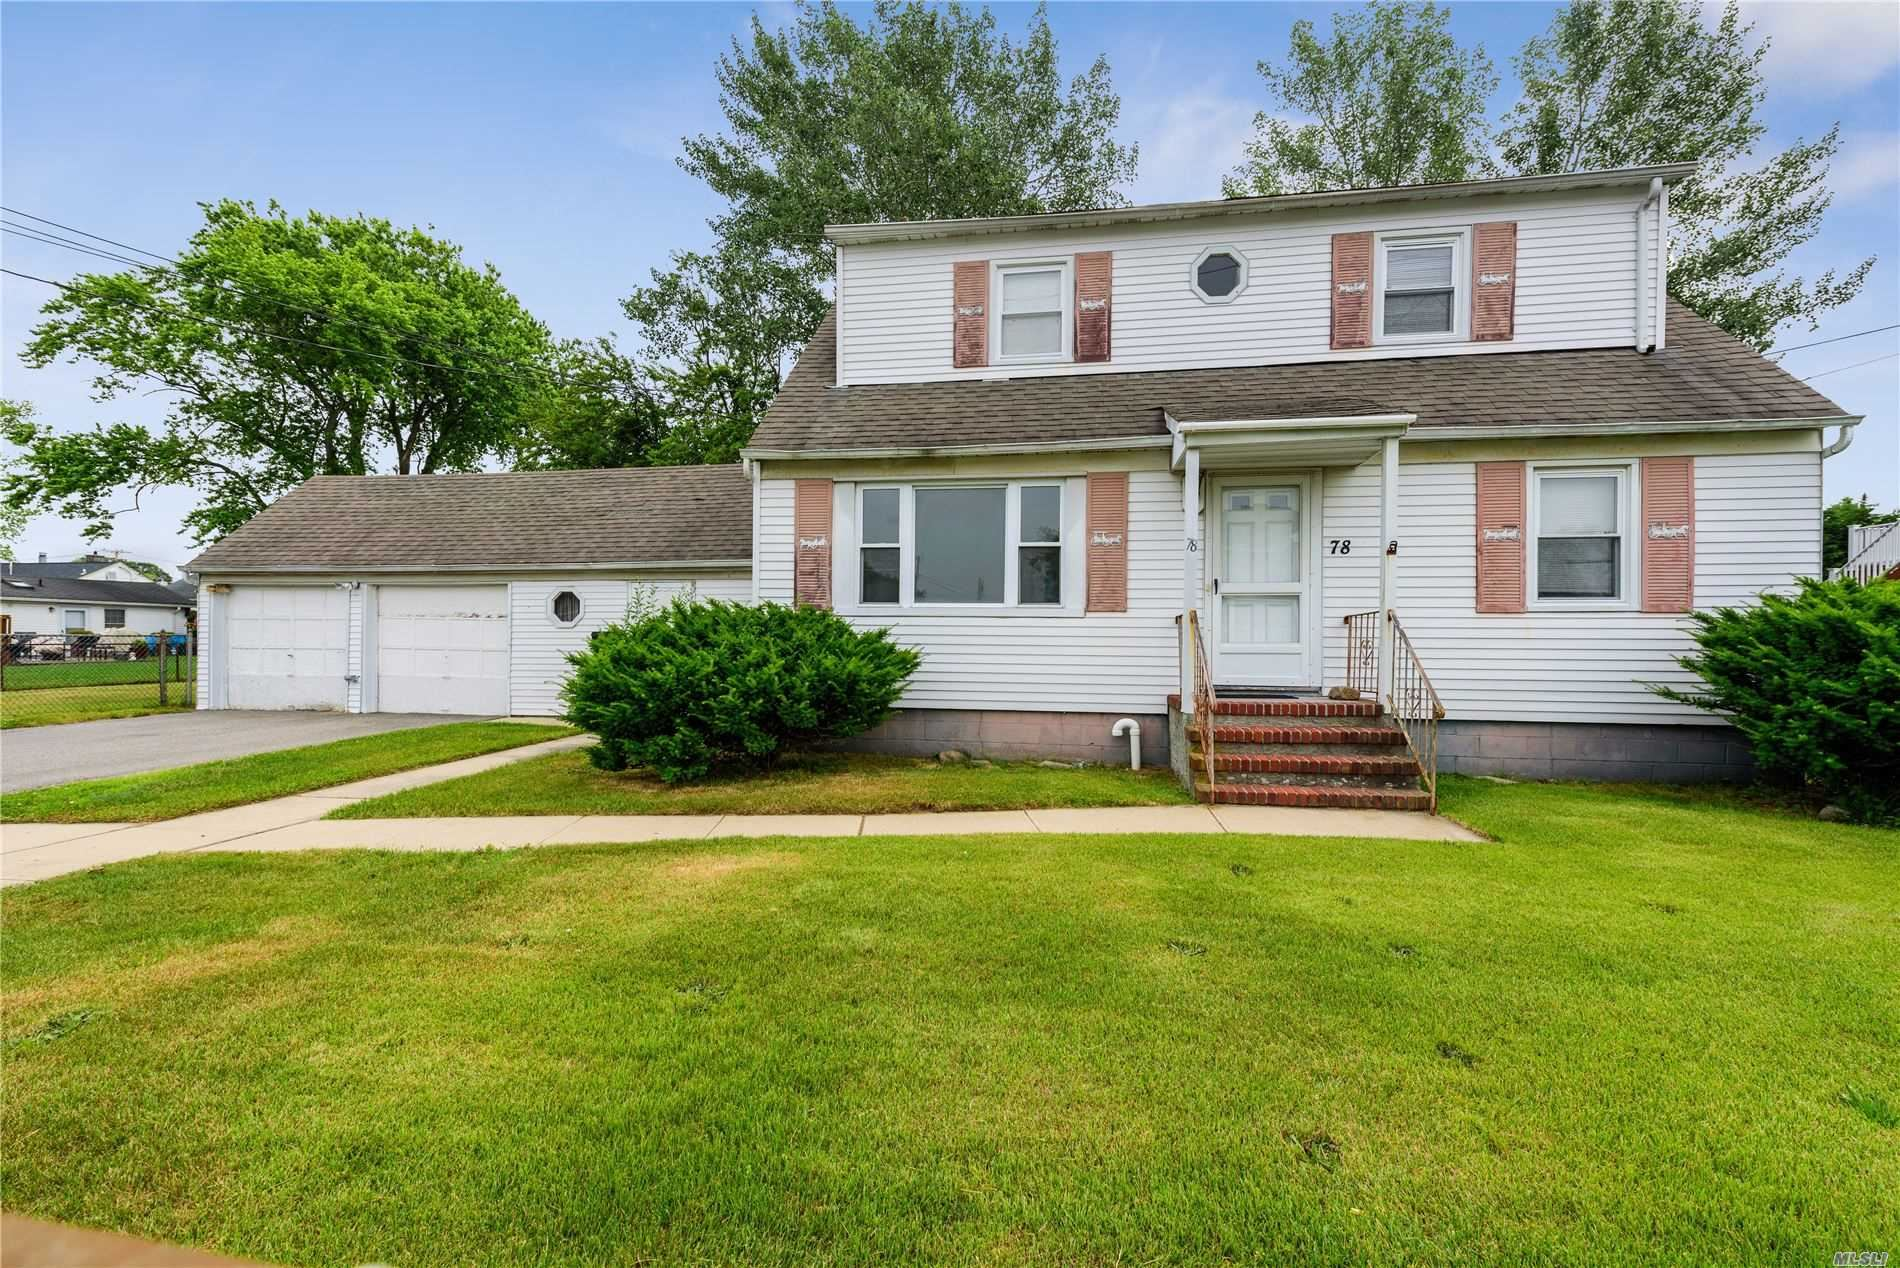 78 Coolidge Avenue, Amityville, NY 11701 - MLS#: 3225849